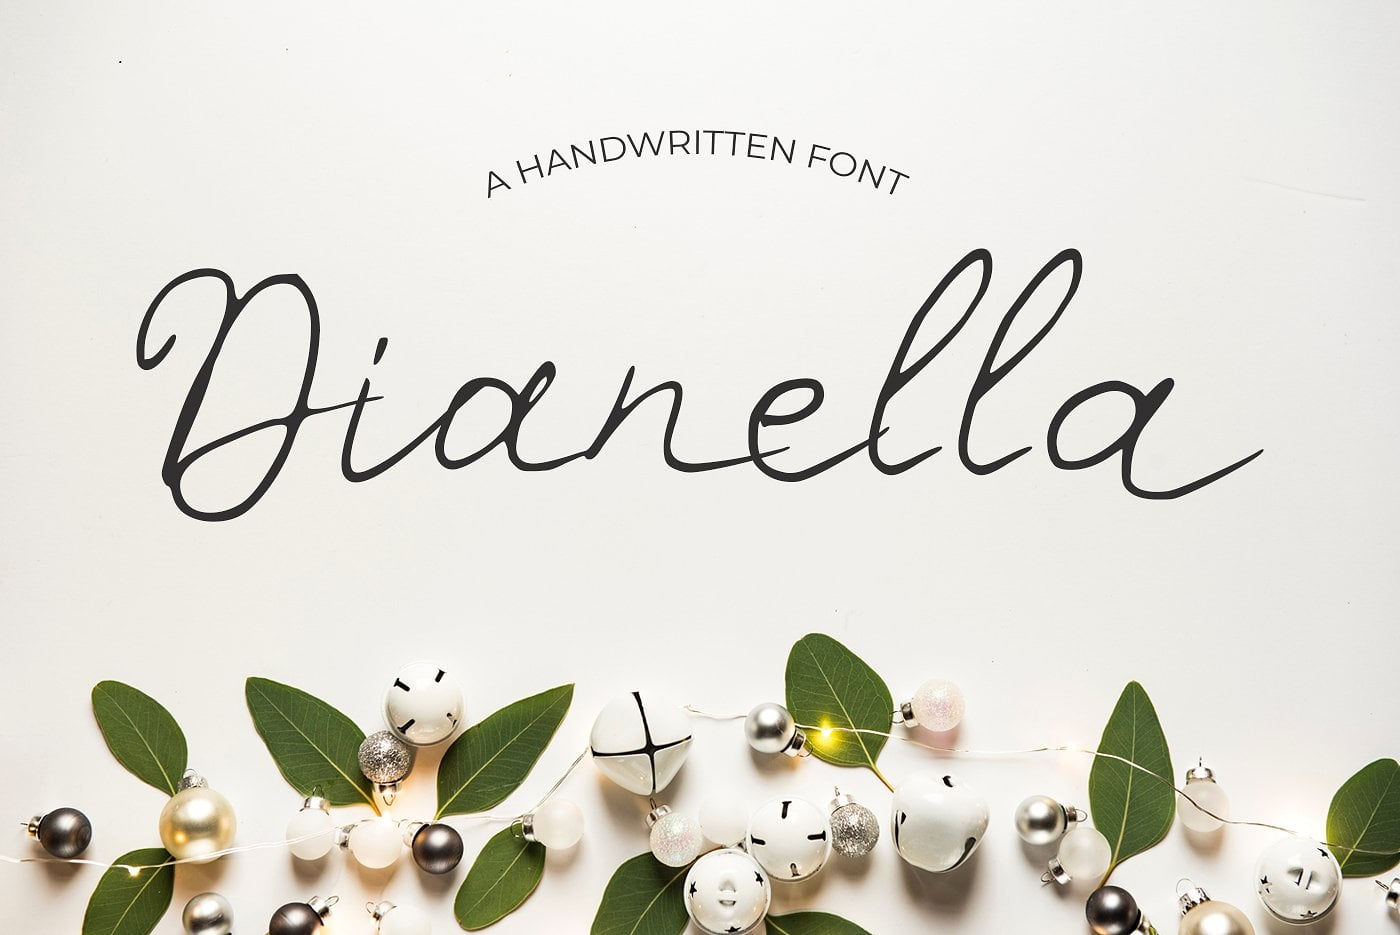 15 Creative Handmade Fonts - $19 ONLY - main image. 10